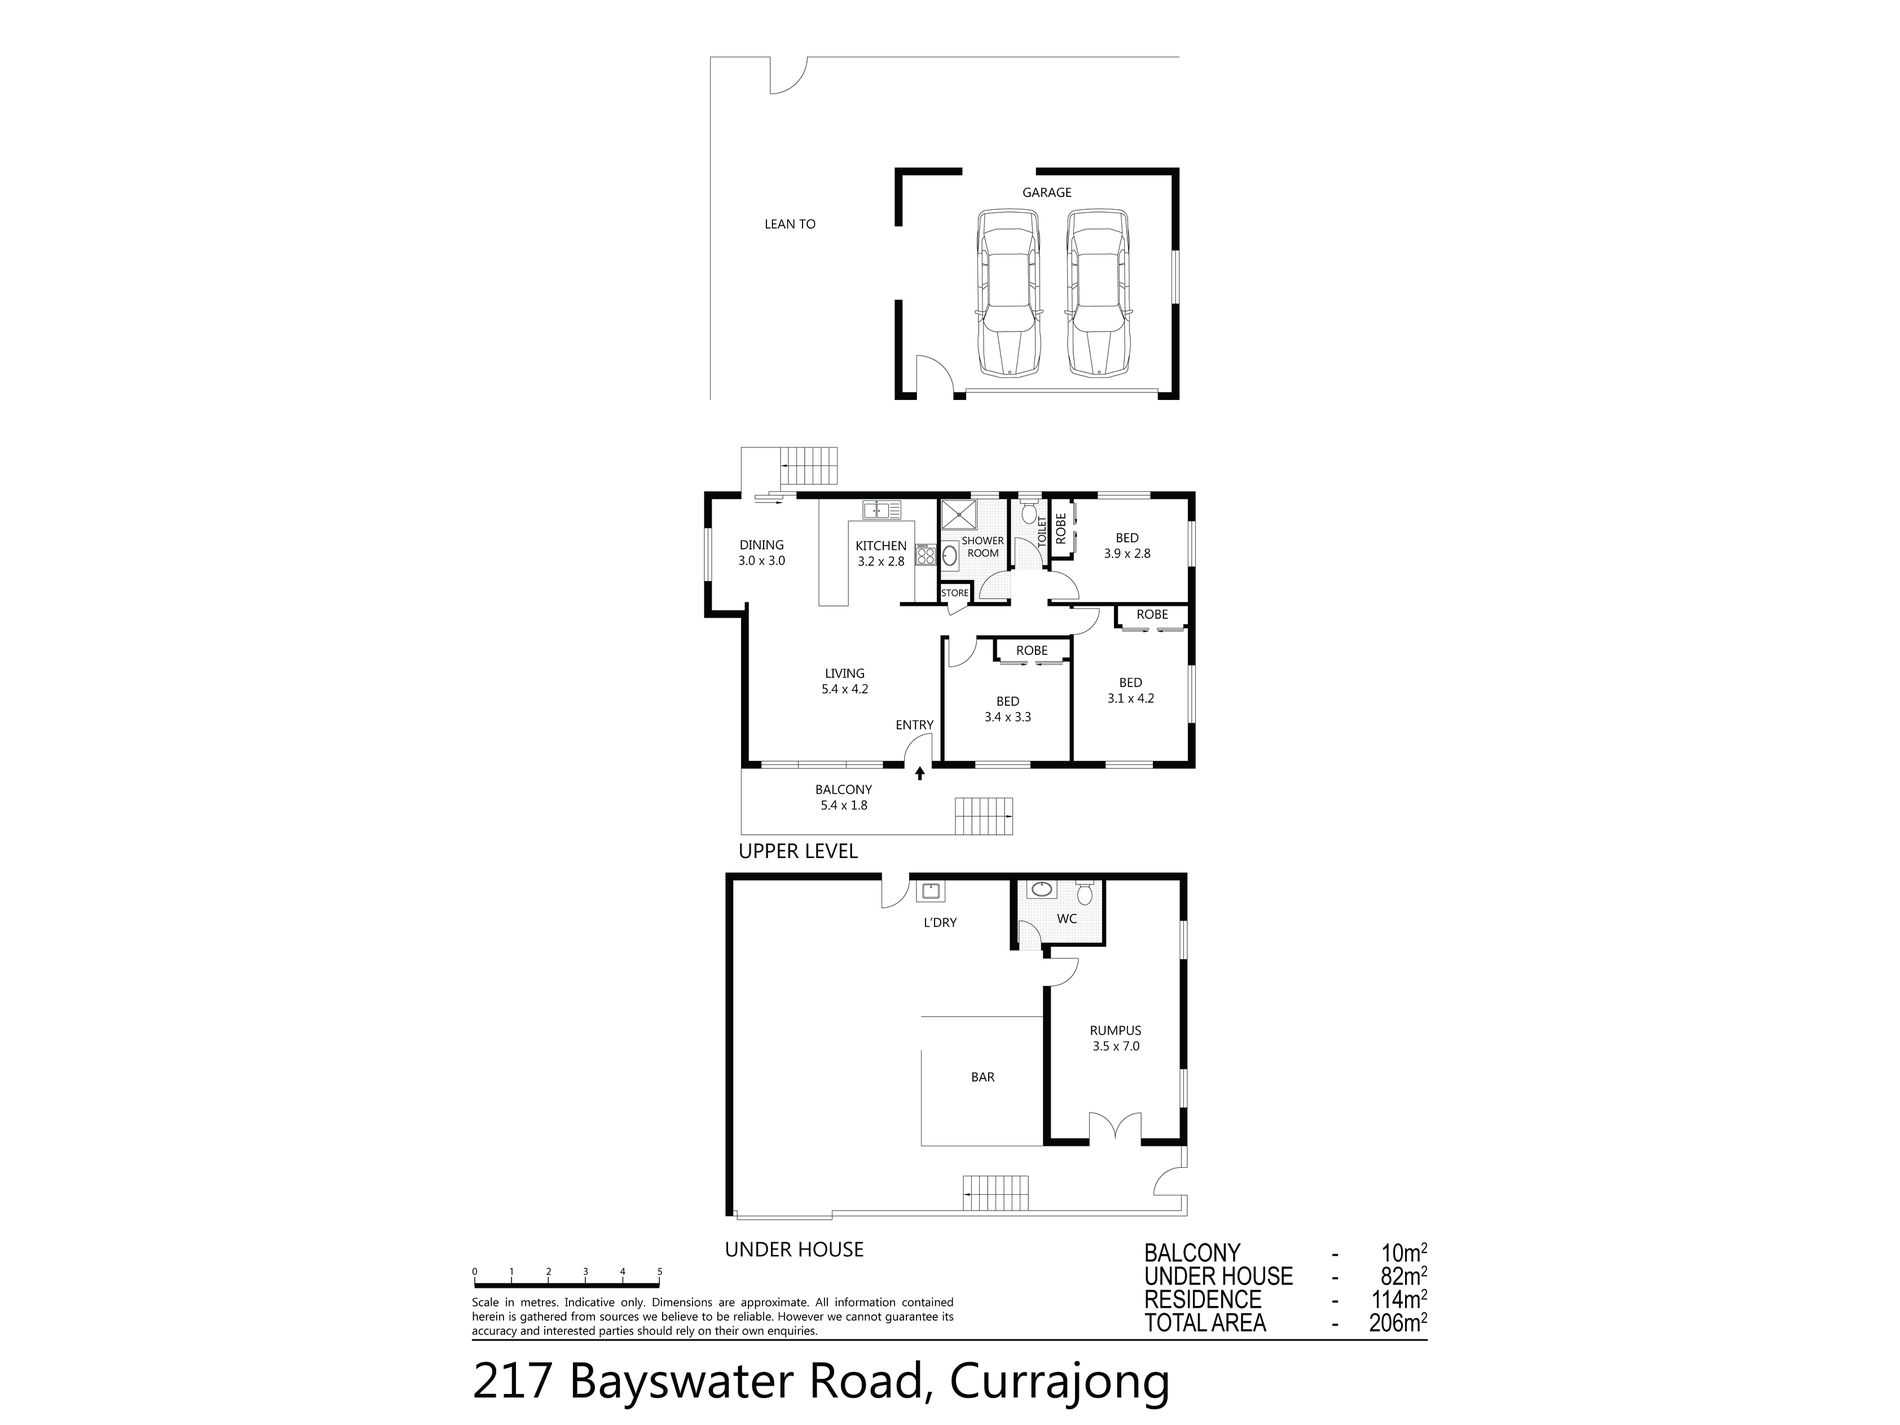 217 Bayswater Road, Currajong